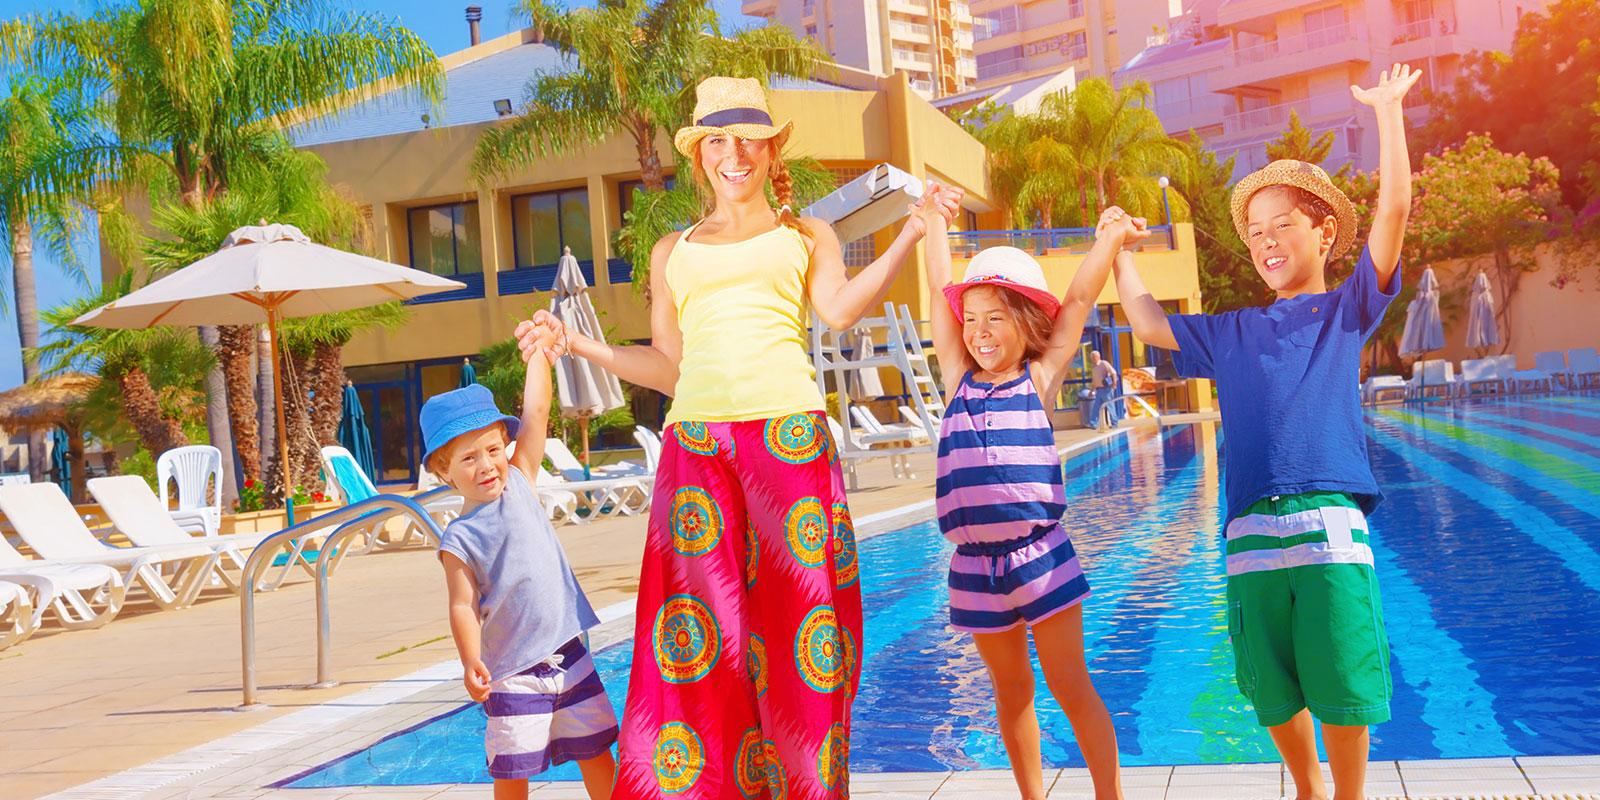 Constructii piscine publice si rezidentiale elcora piscine for Constructii piscine romania